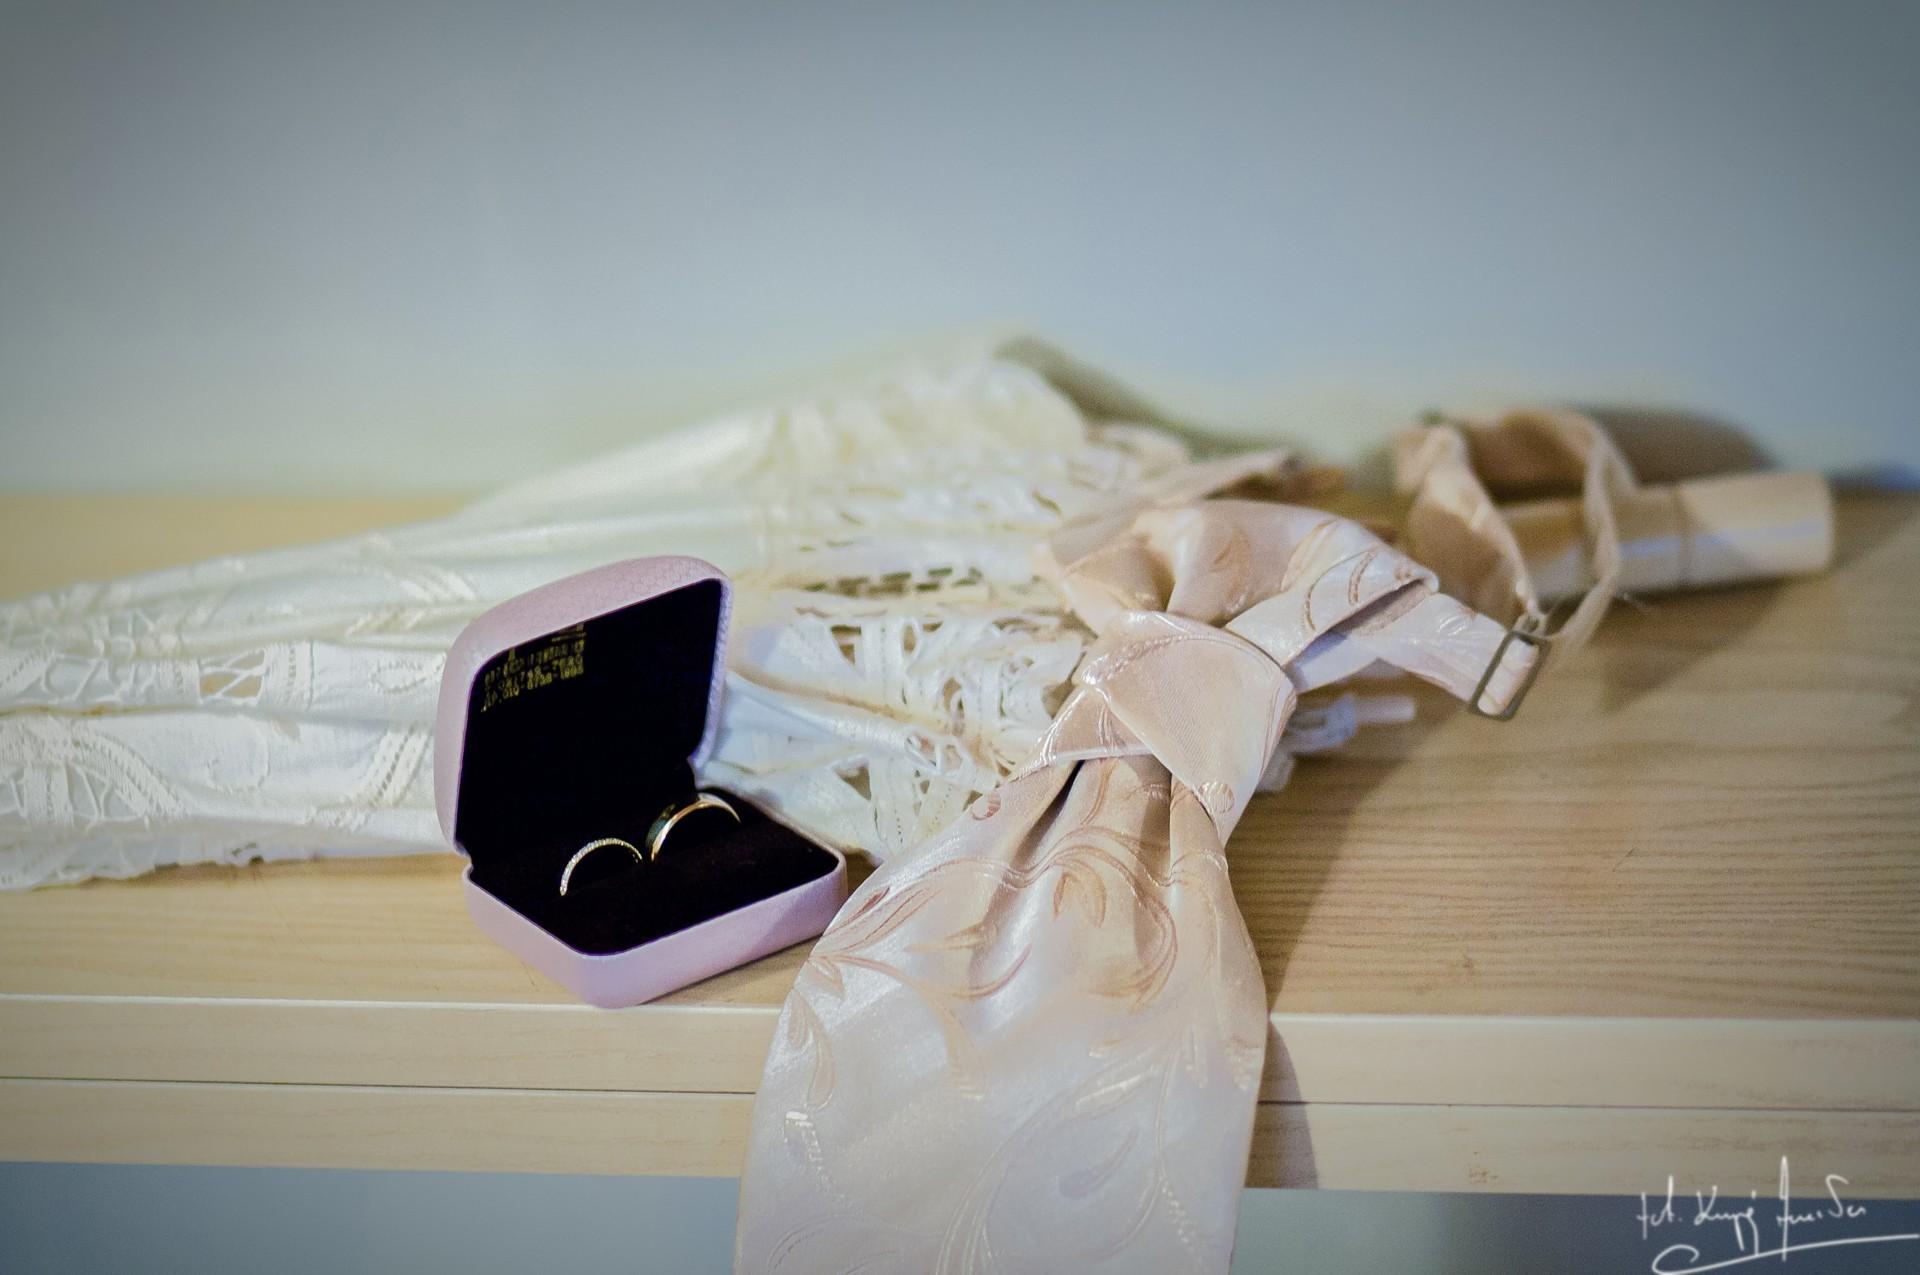 Ślub w wenecji 2 Manuela Luiza & Young Seon Song